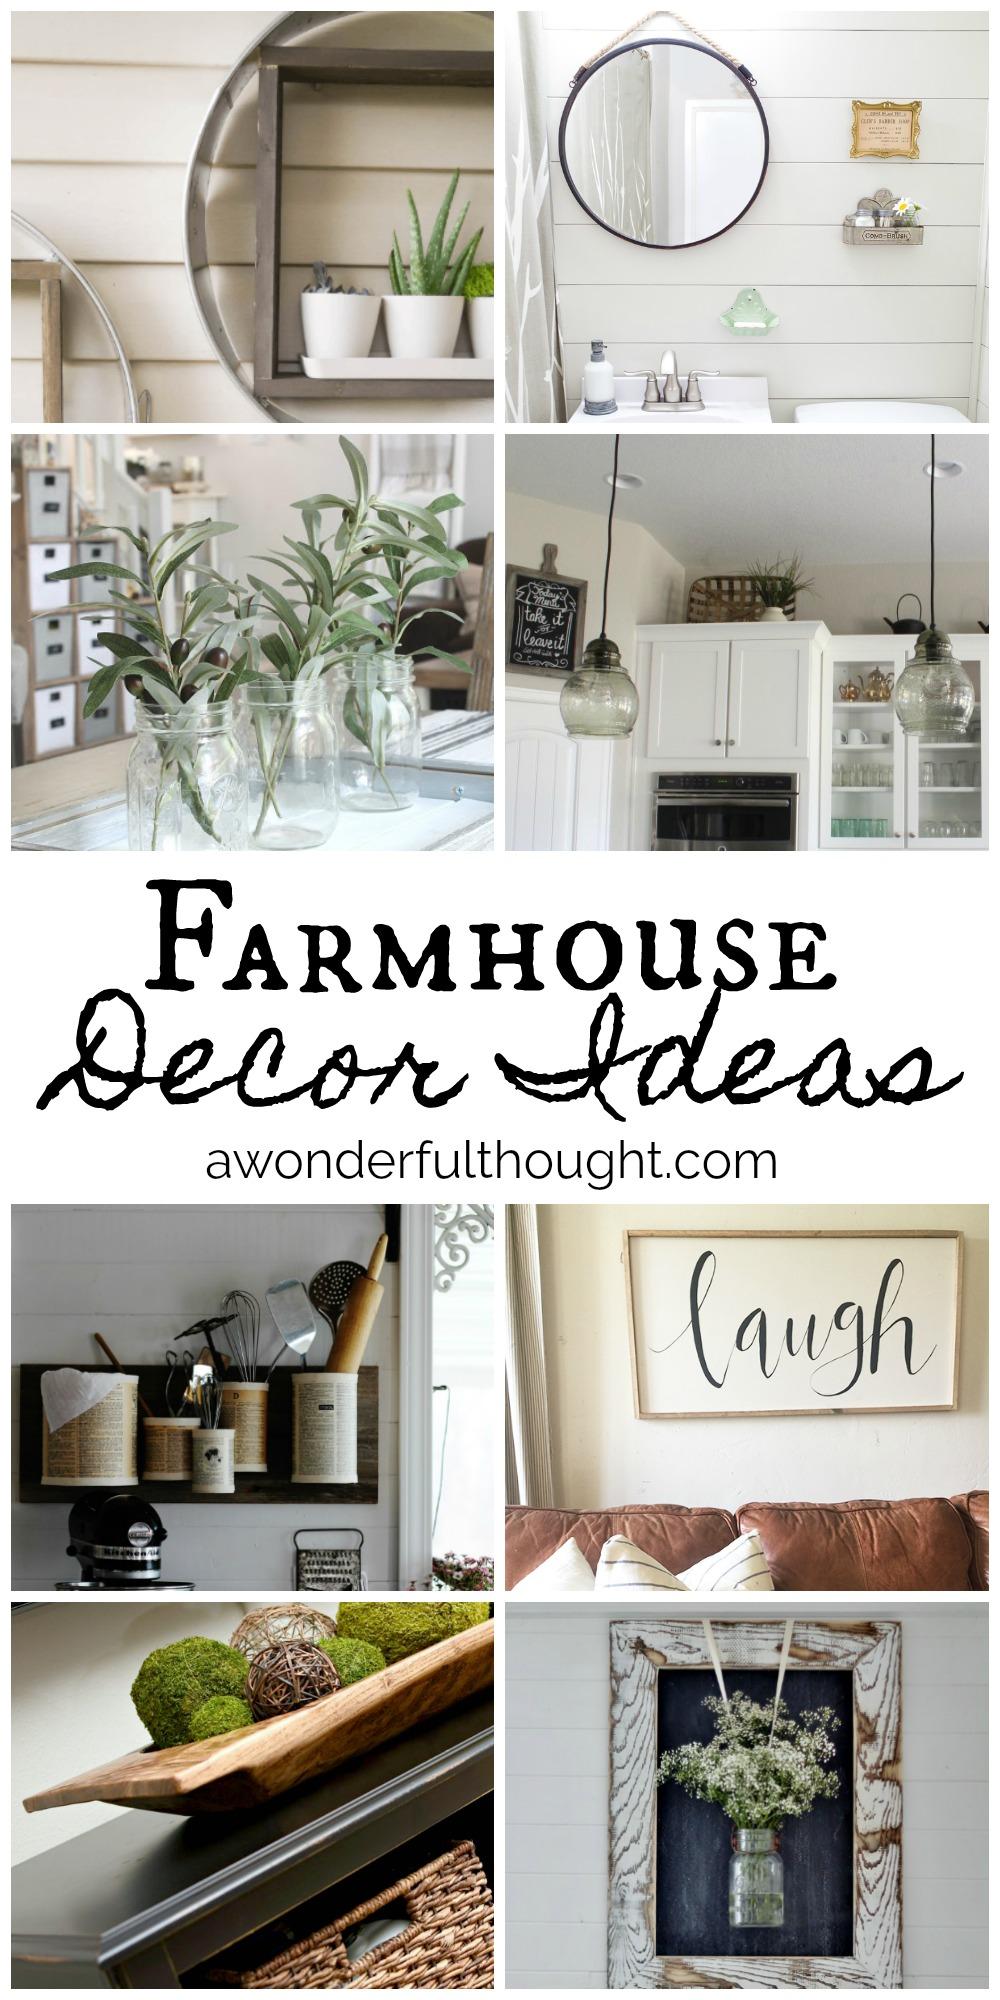 Farmhouse decor ideas mm 164 a wonderful thought - What is farmhouse style ...